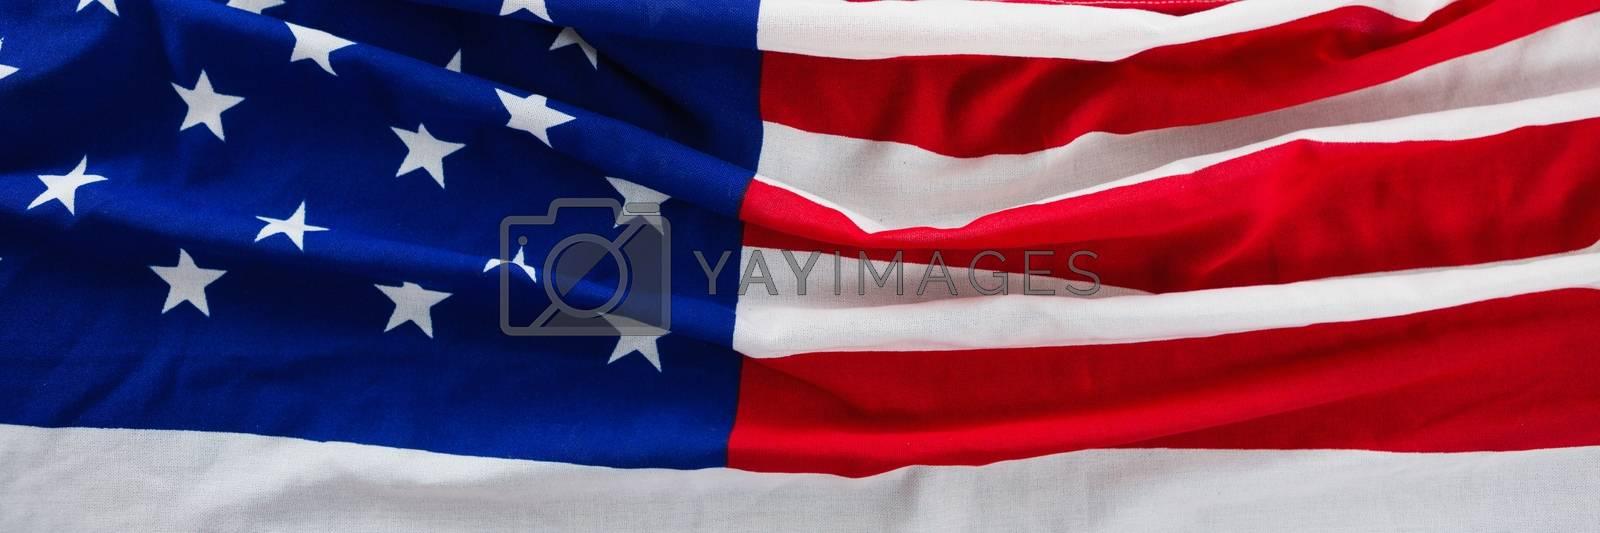 USA flag by Wavebreakmedia